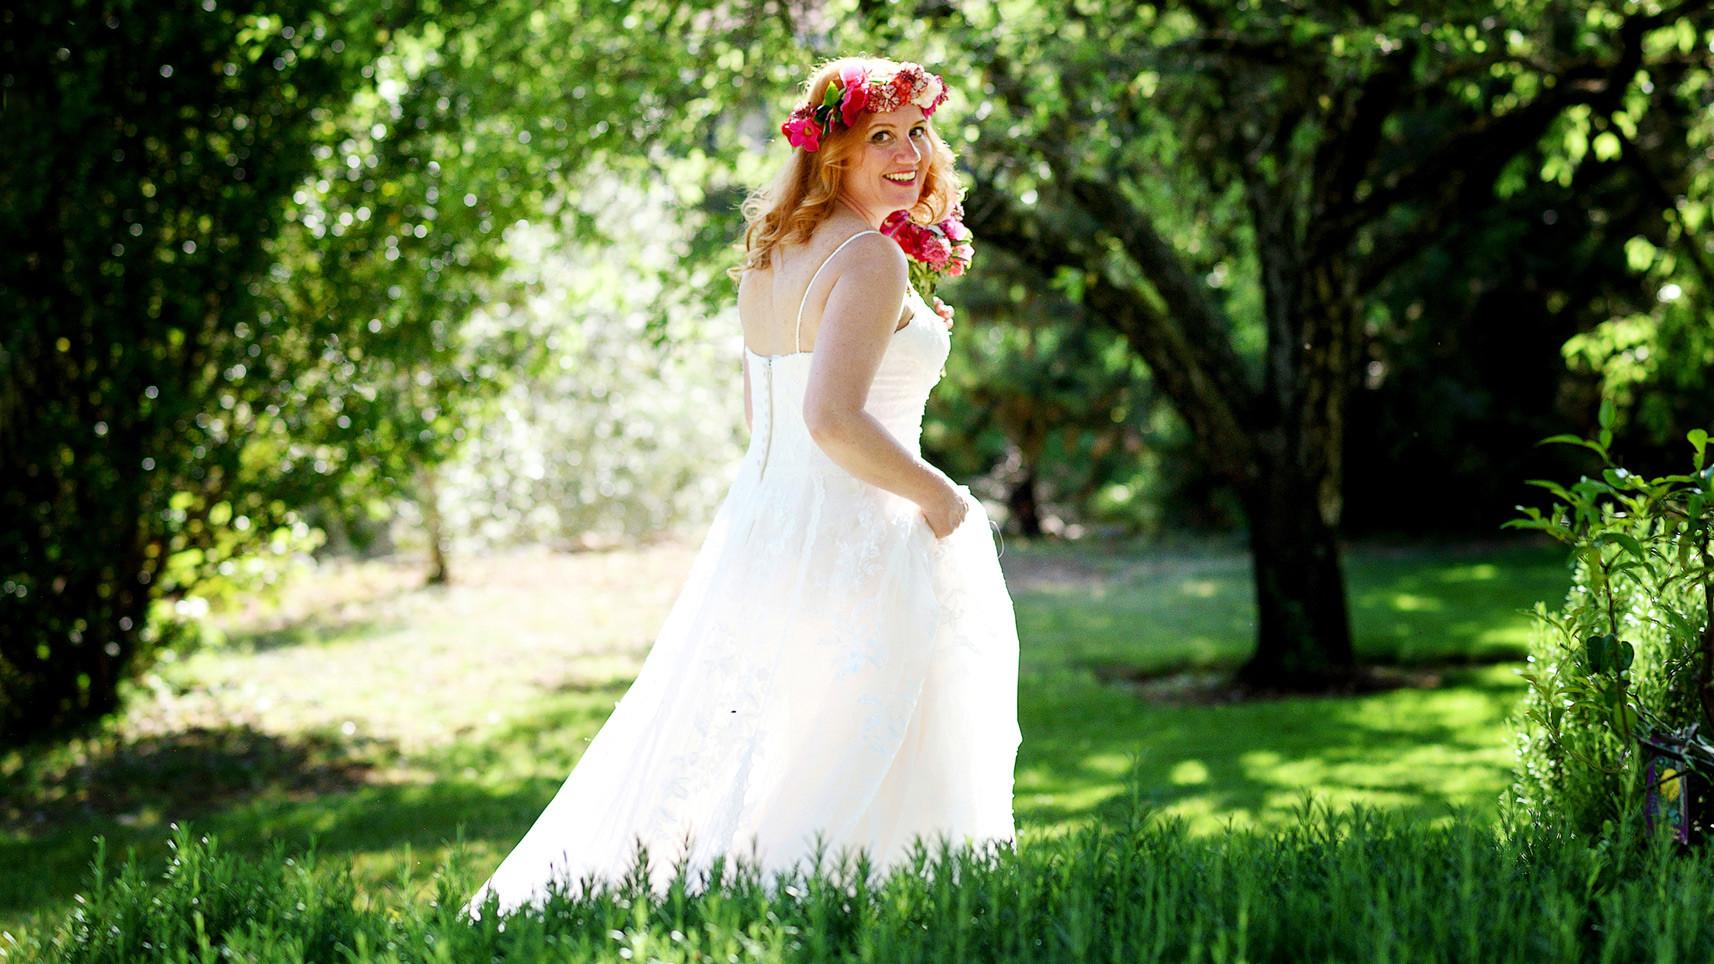 beautiful-wedding-portrait-photography-t